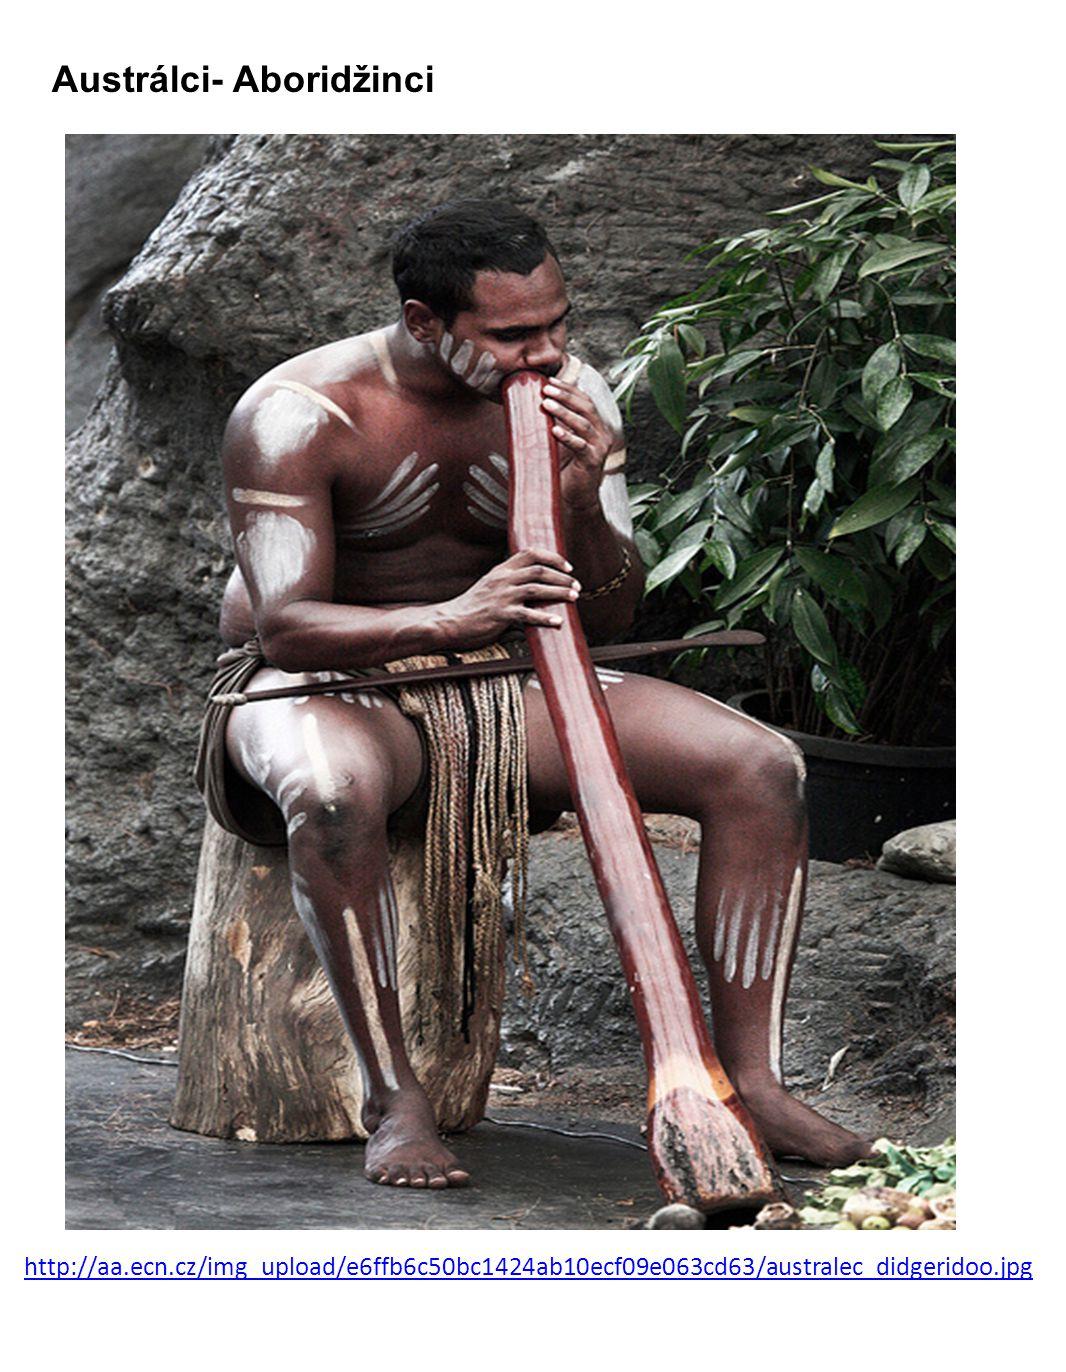 http://aa.ecn.cz/img_upload/e6ffb6c50bc1424ab10ecf09e063cd63/australec_didgeridoo.jpg Austrálci- Aboridžinci